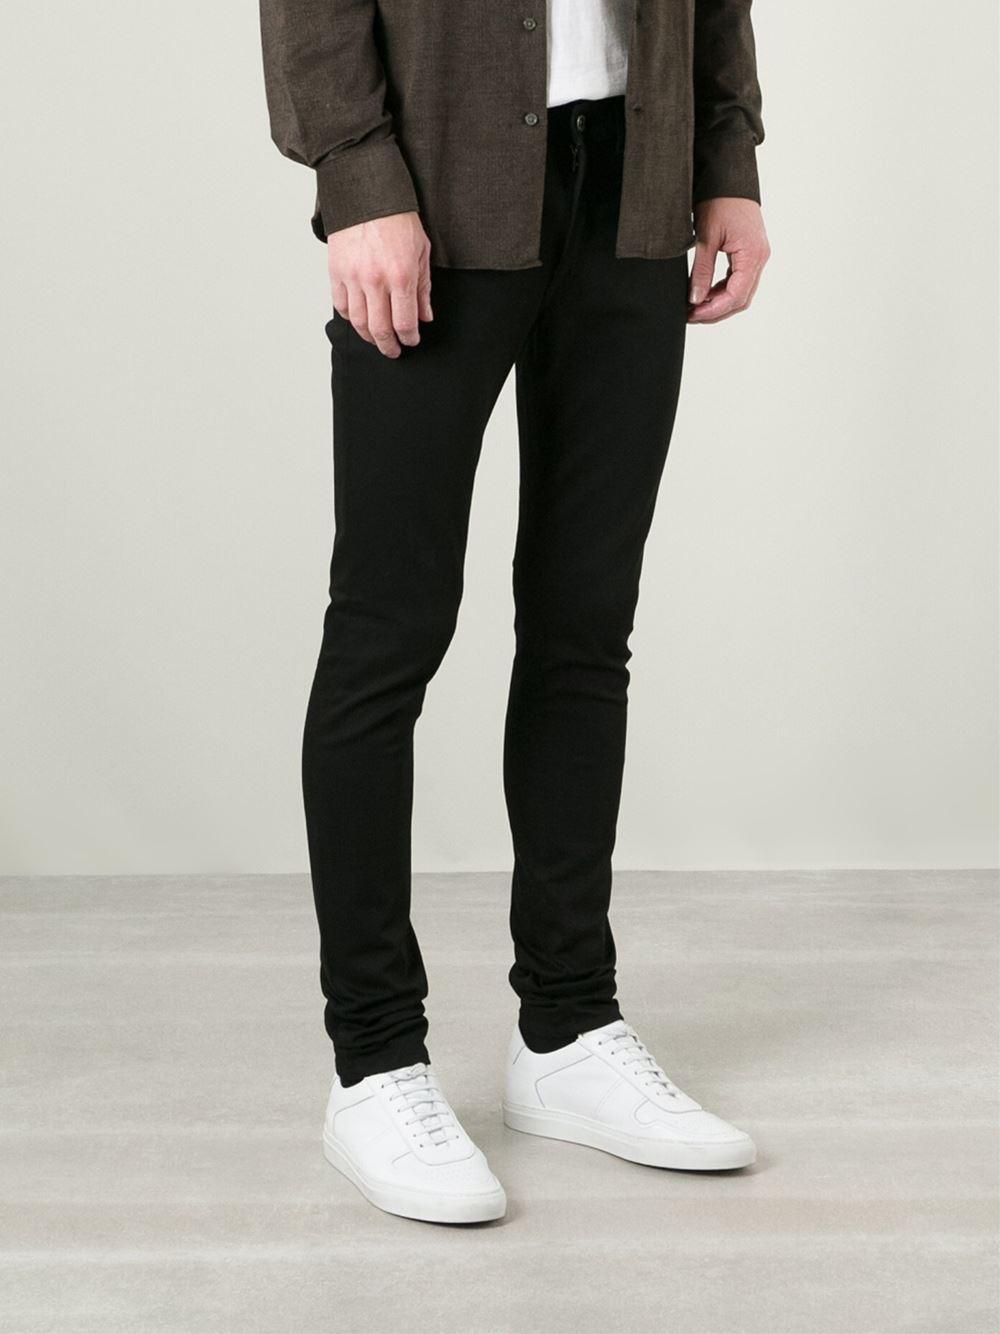 Lyst - Acne Studios  Thin  Skinny Jeans in Black for Men 6cde4247483